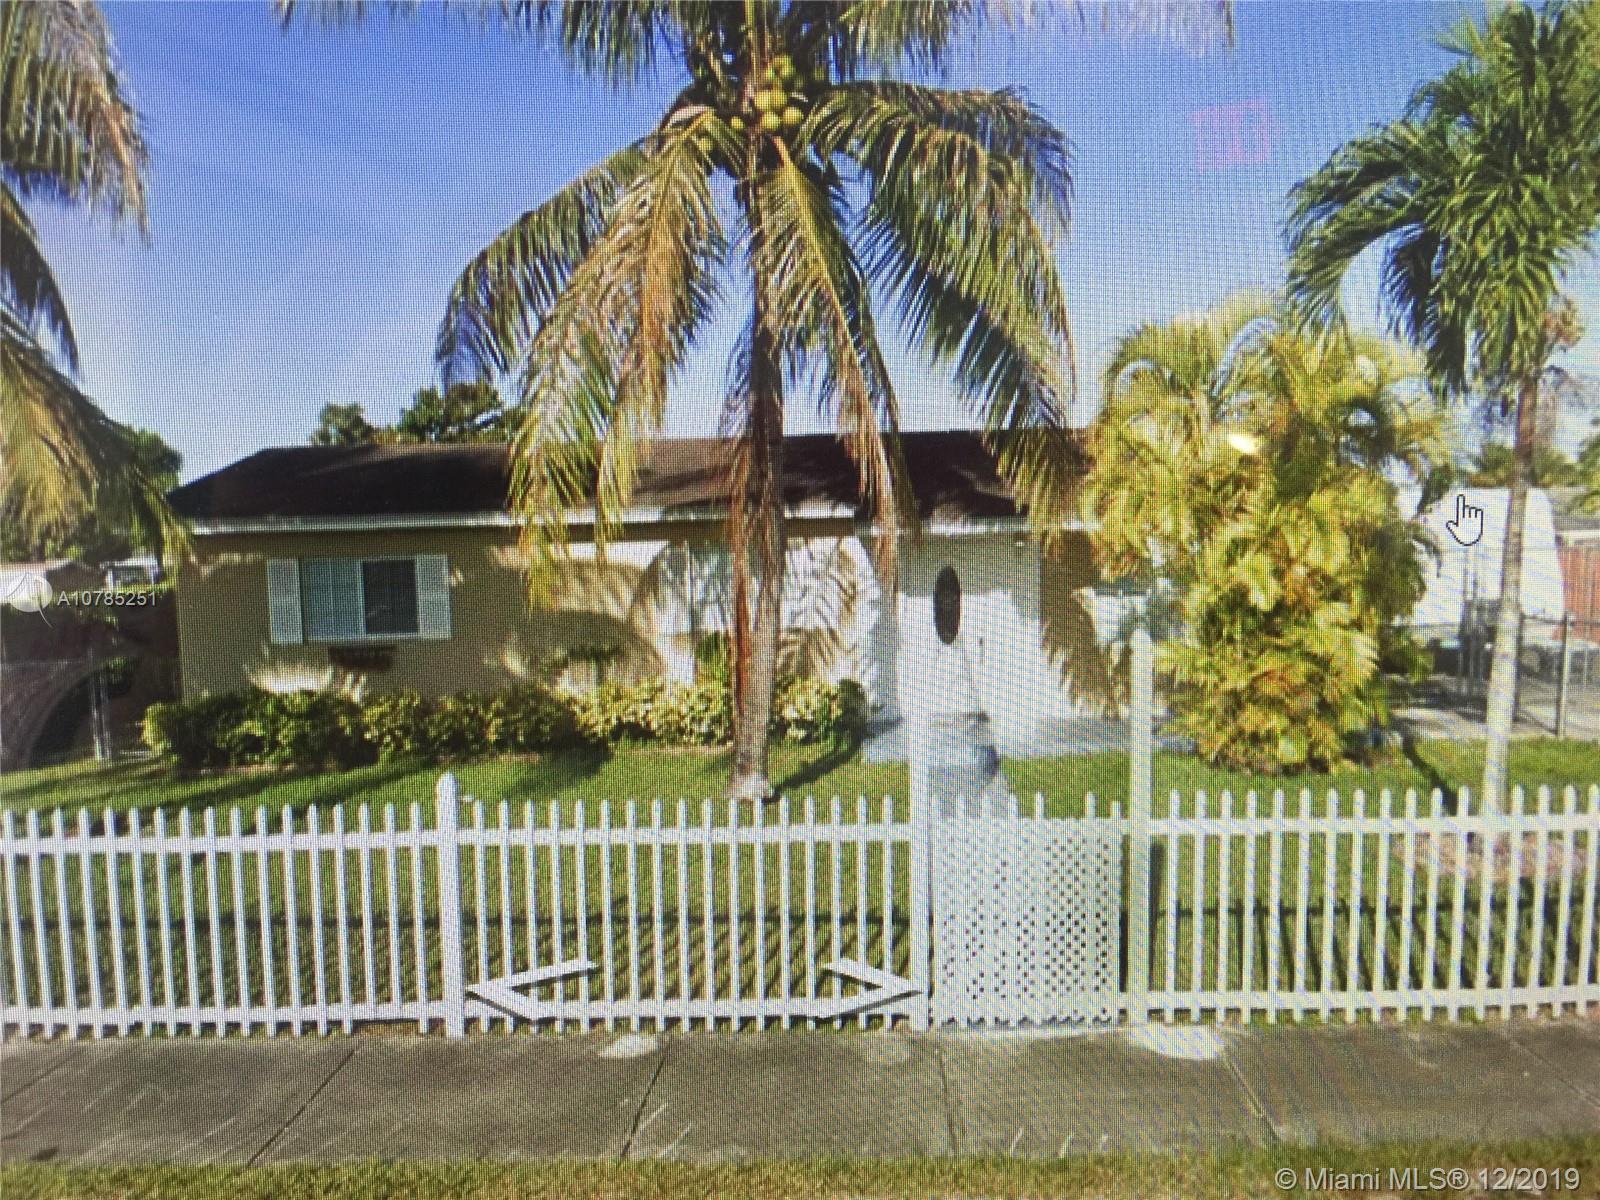 30614 SW 152nd Ct, Homestead, FL 33033 - Homestead, FL real estate listing